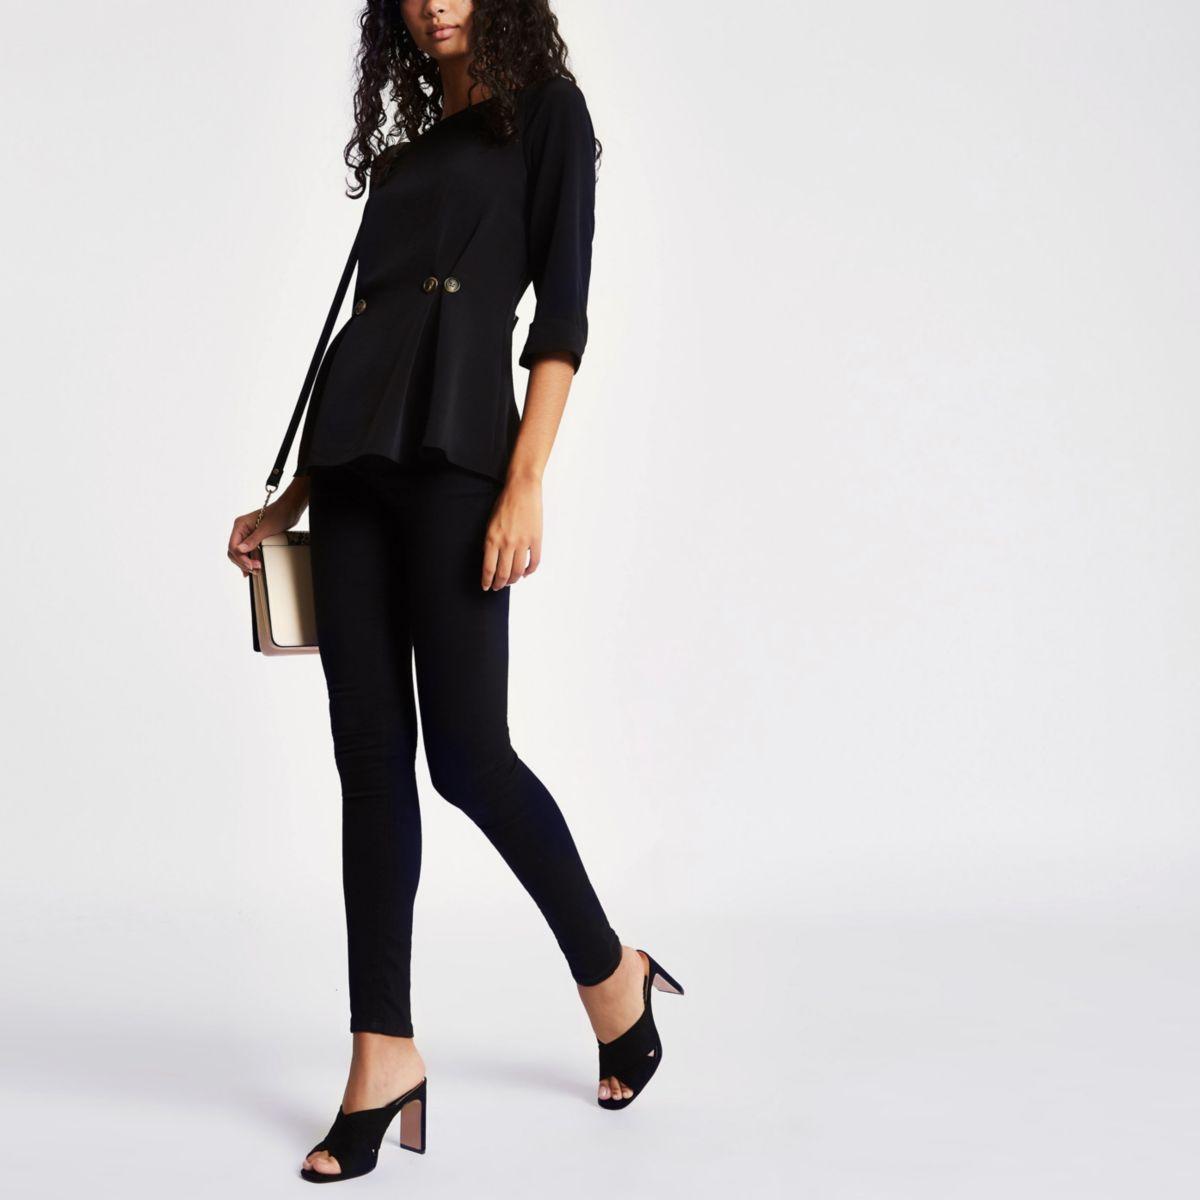 Black button waist loose fit top